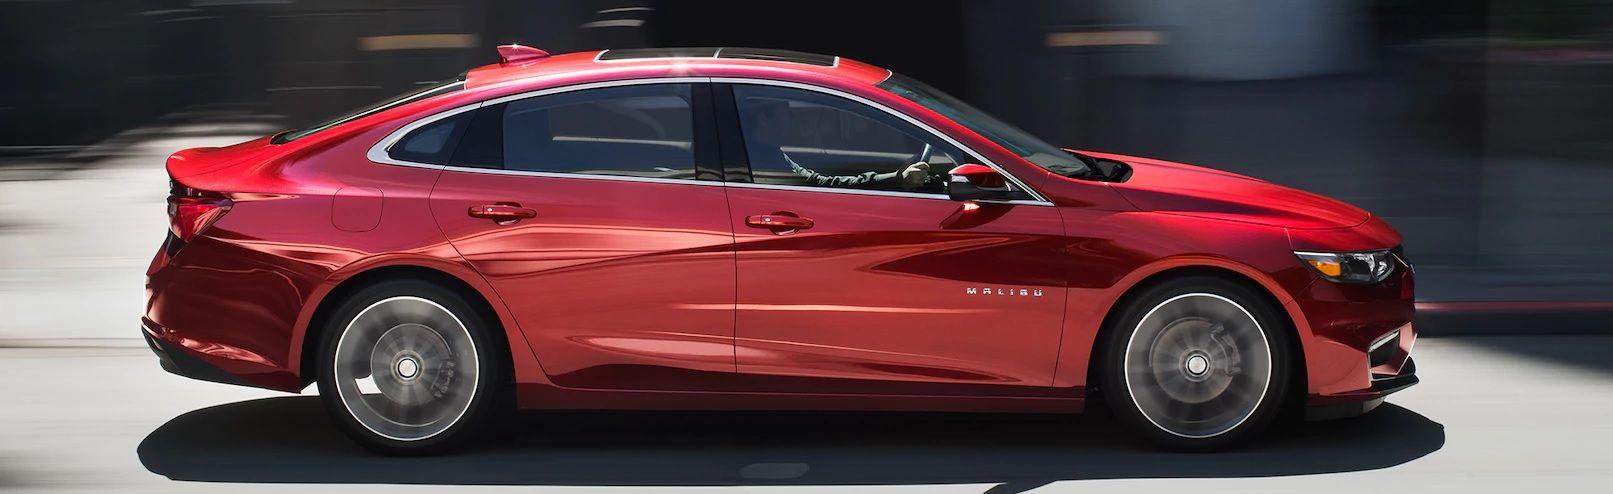 2018 Chevrolet Malibu for Sale near Valparaiso, IN